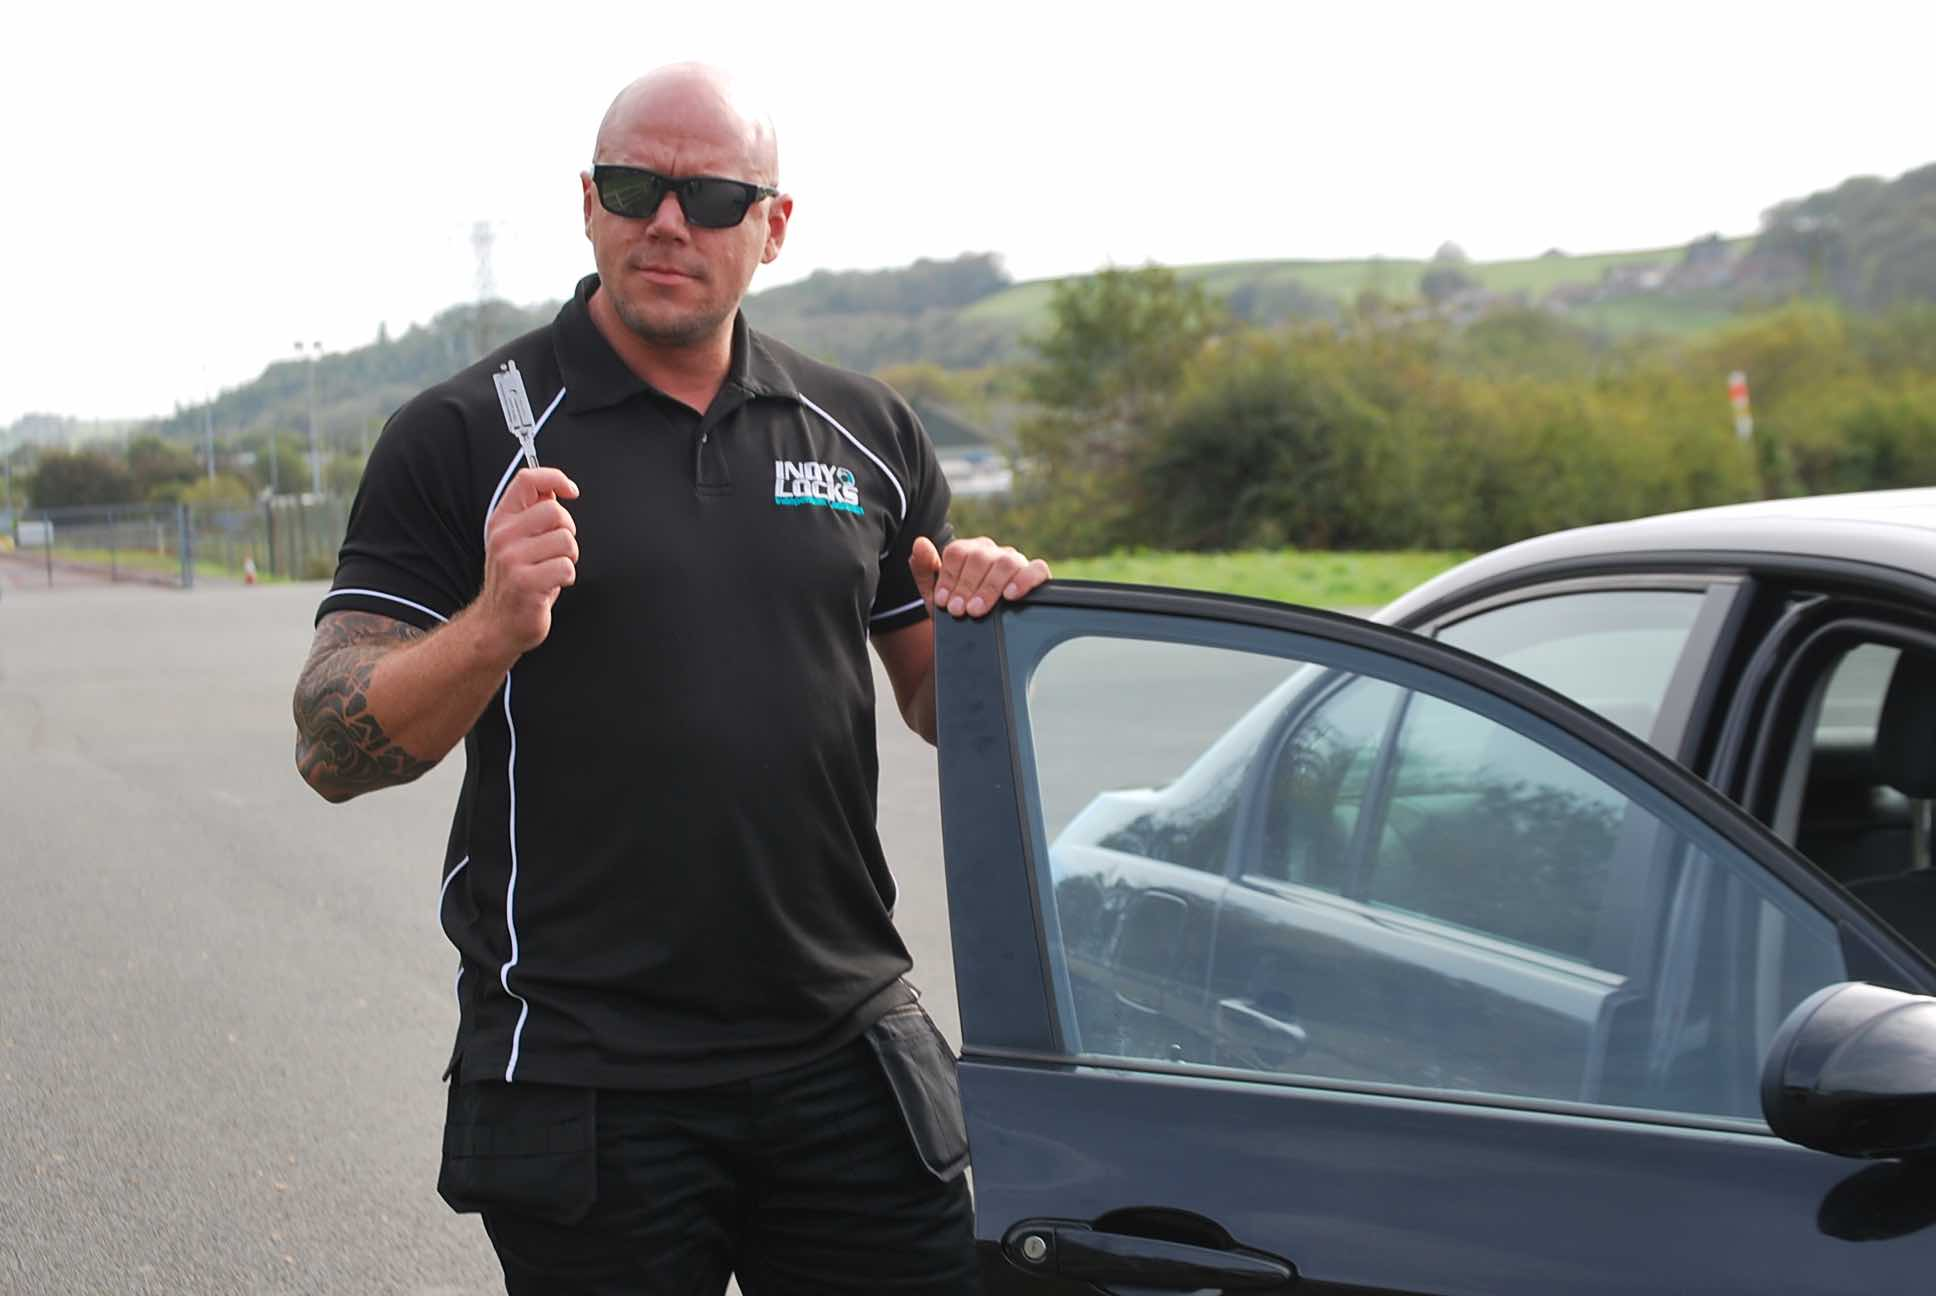 Indy locks Car Locksmith Carmarthen Swansea Llanelli Locksmith Services Vehicle Carmarthen